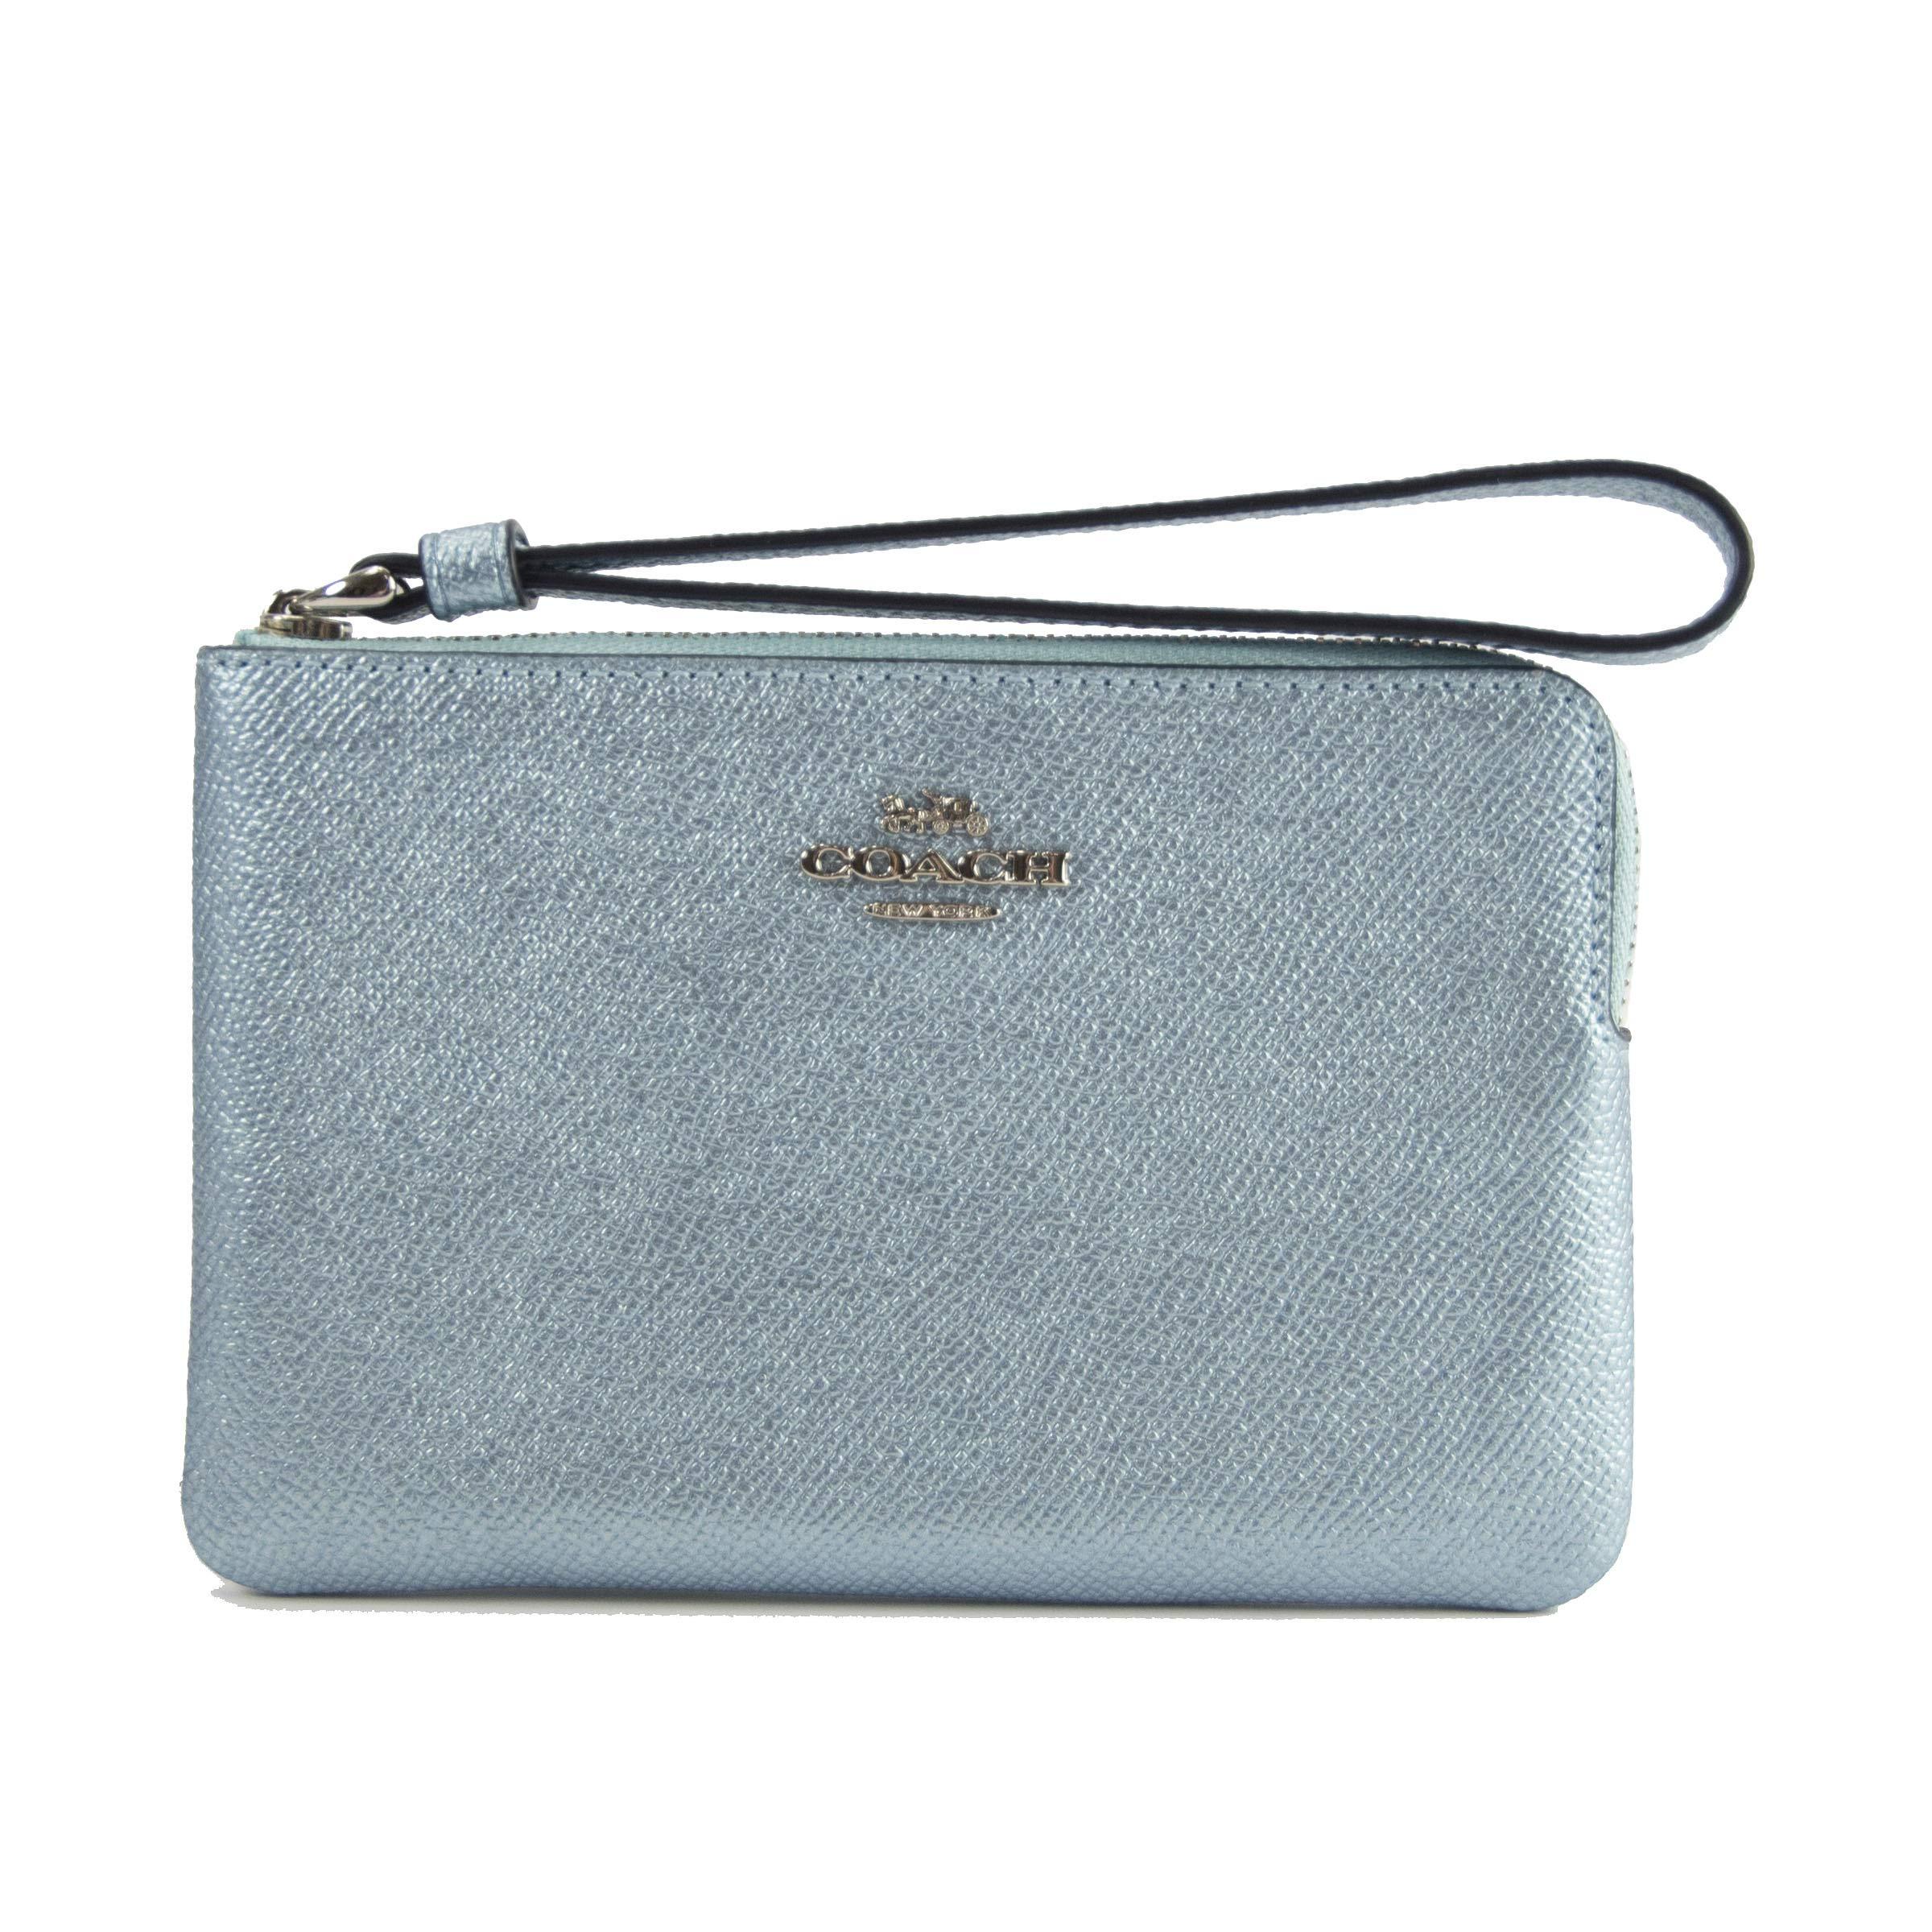 Coach Metallic Sky Blue Leather Flat Wristlet Wallet Bag 21070